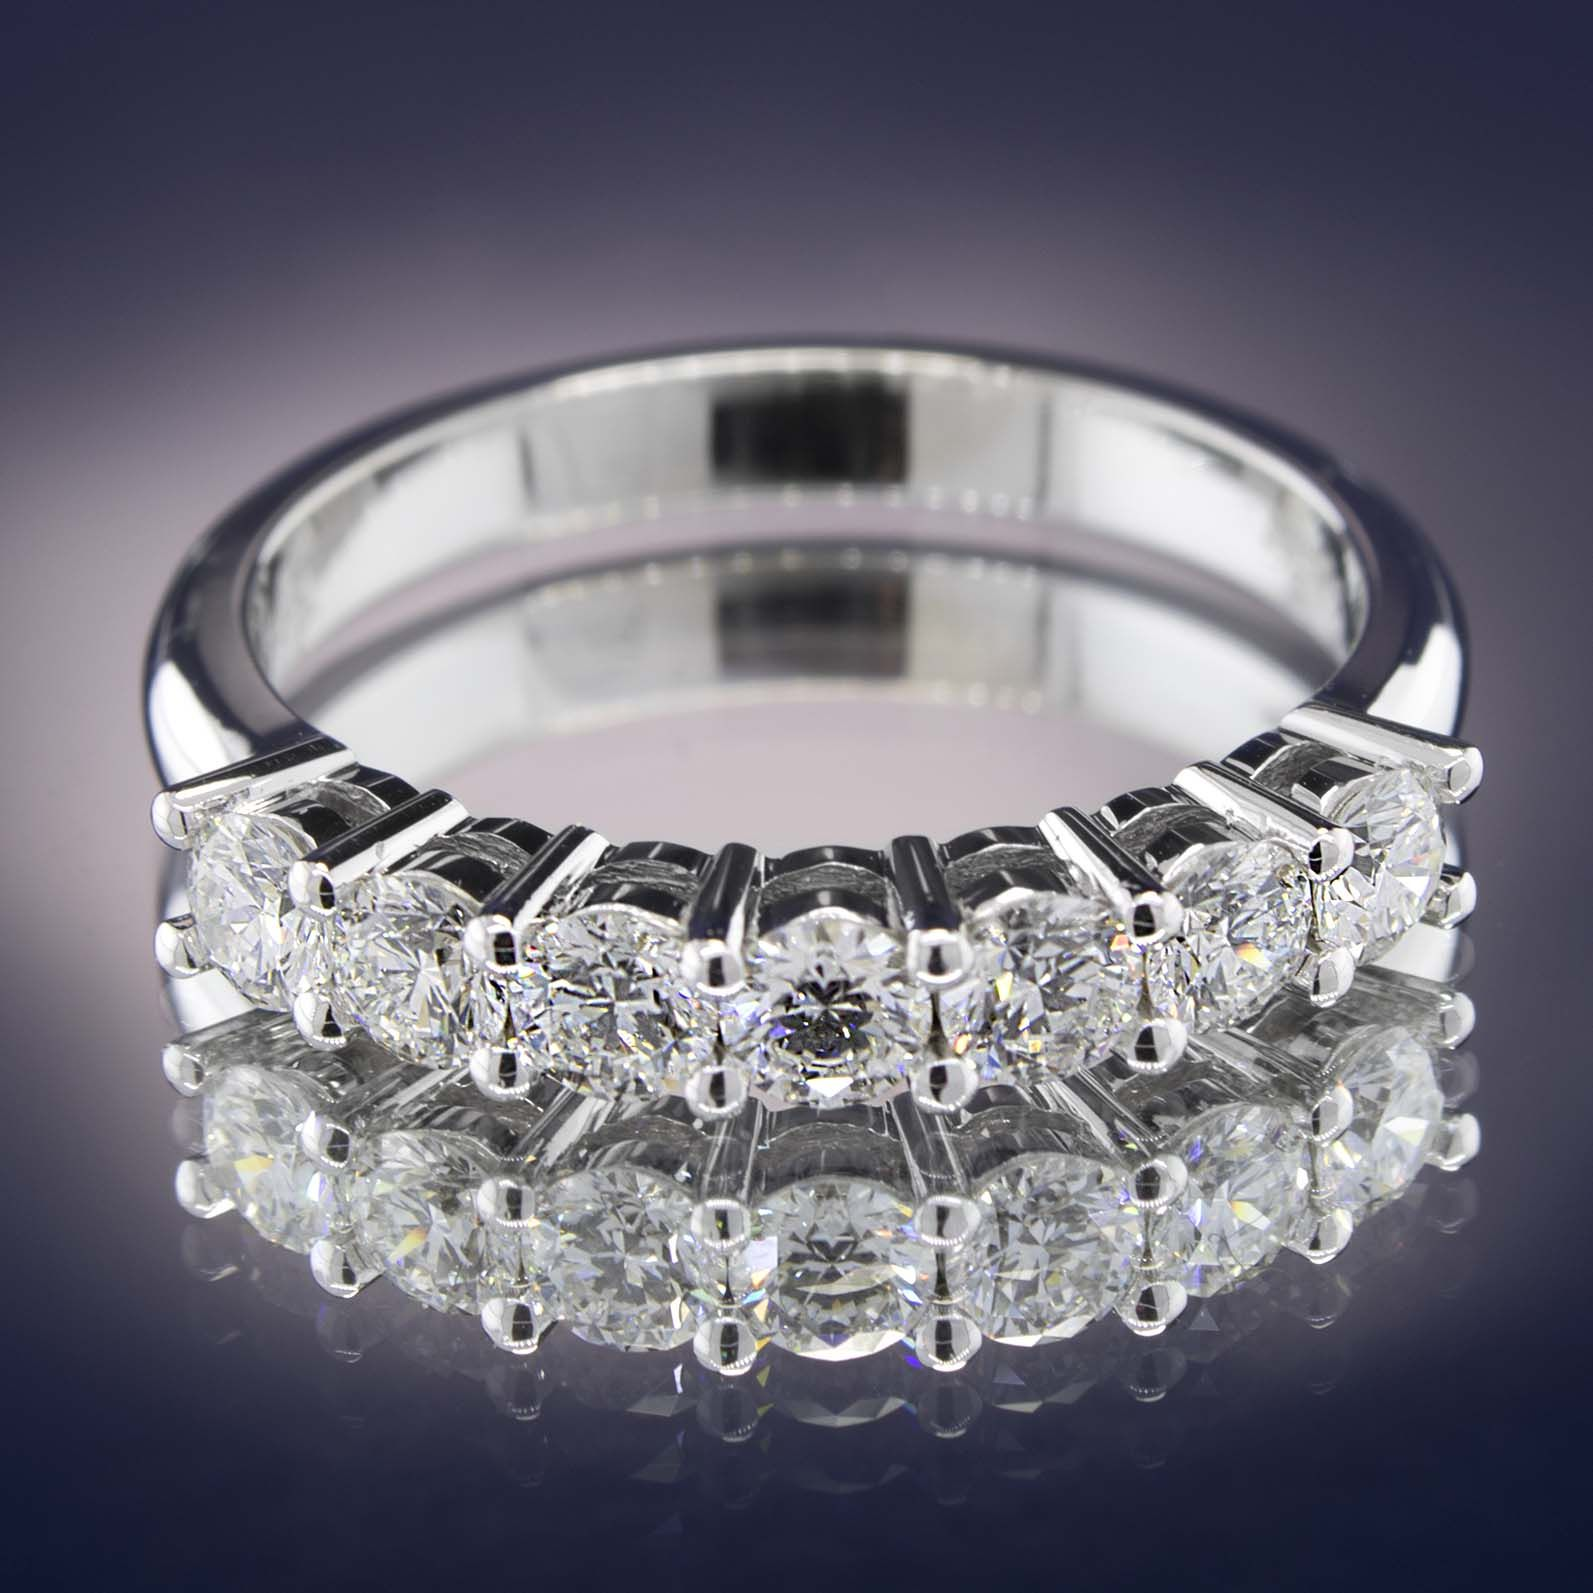 Wedding Anniversary Diamond Ring 0.75 Carats, Gold or